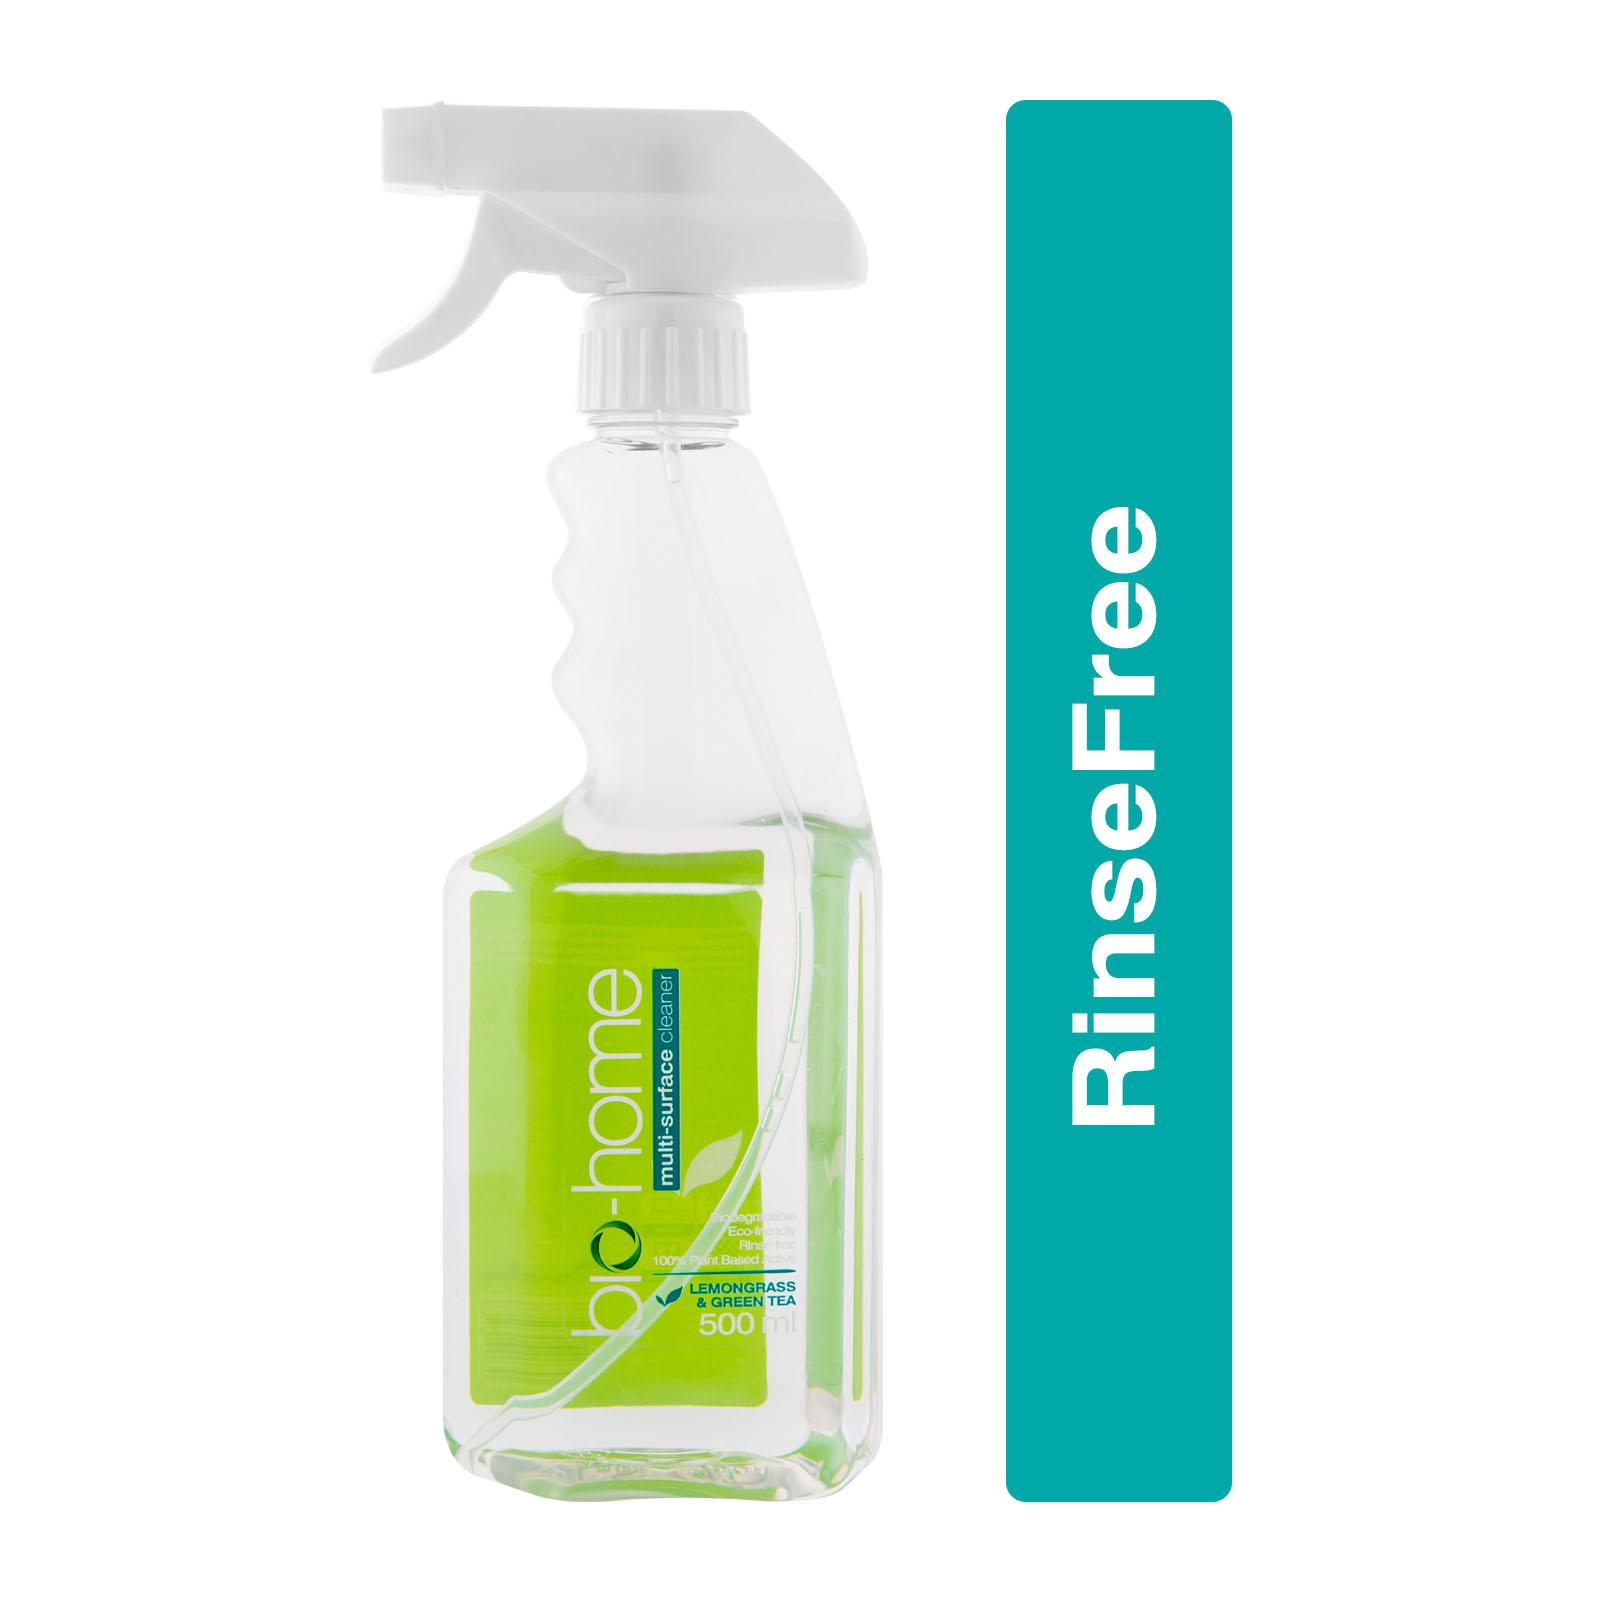 BIO HOME Multi Surface Cleaner Lemongrass& Green Tea 500ml